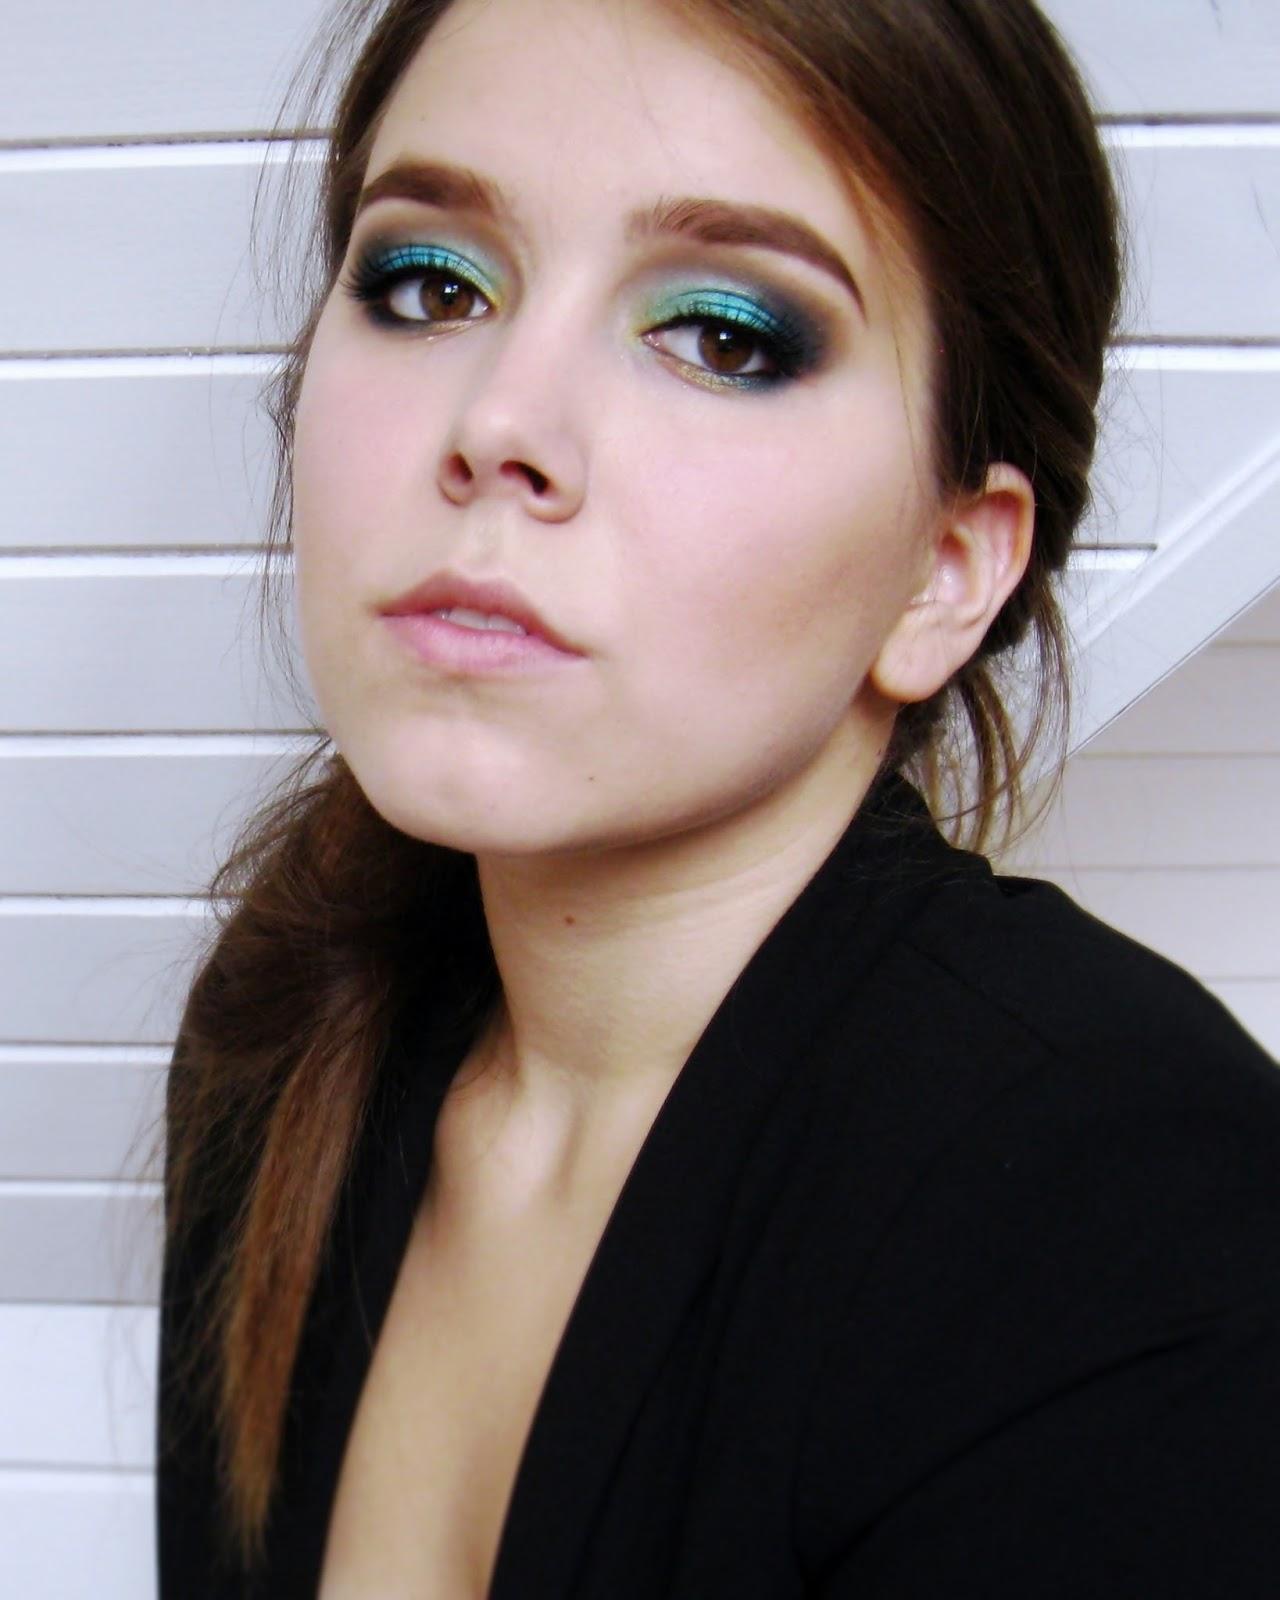 http://colorfulmadworld.blogspot.com/2014/08/make-up-trends-fallwinter-2014-2-metalic.html